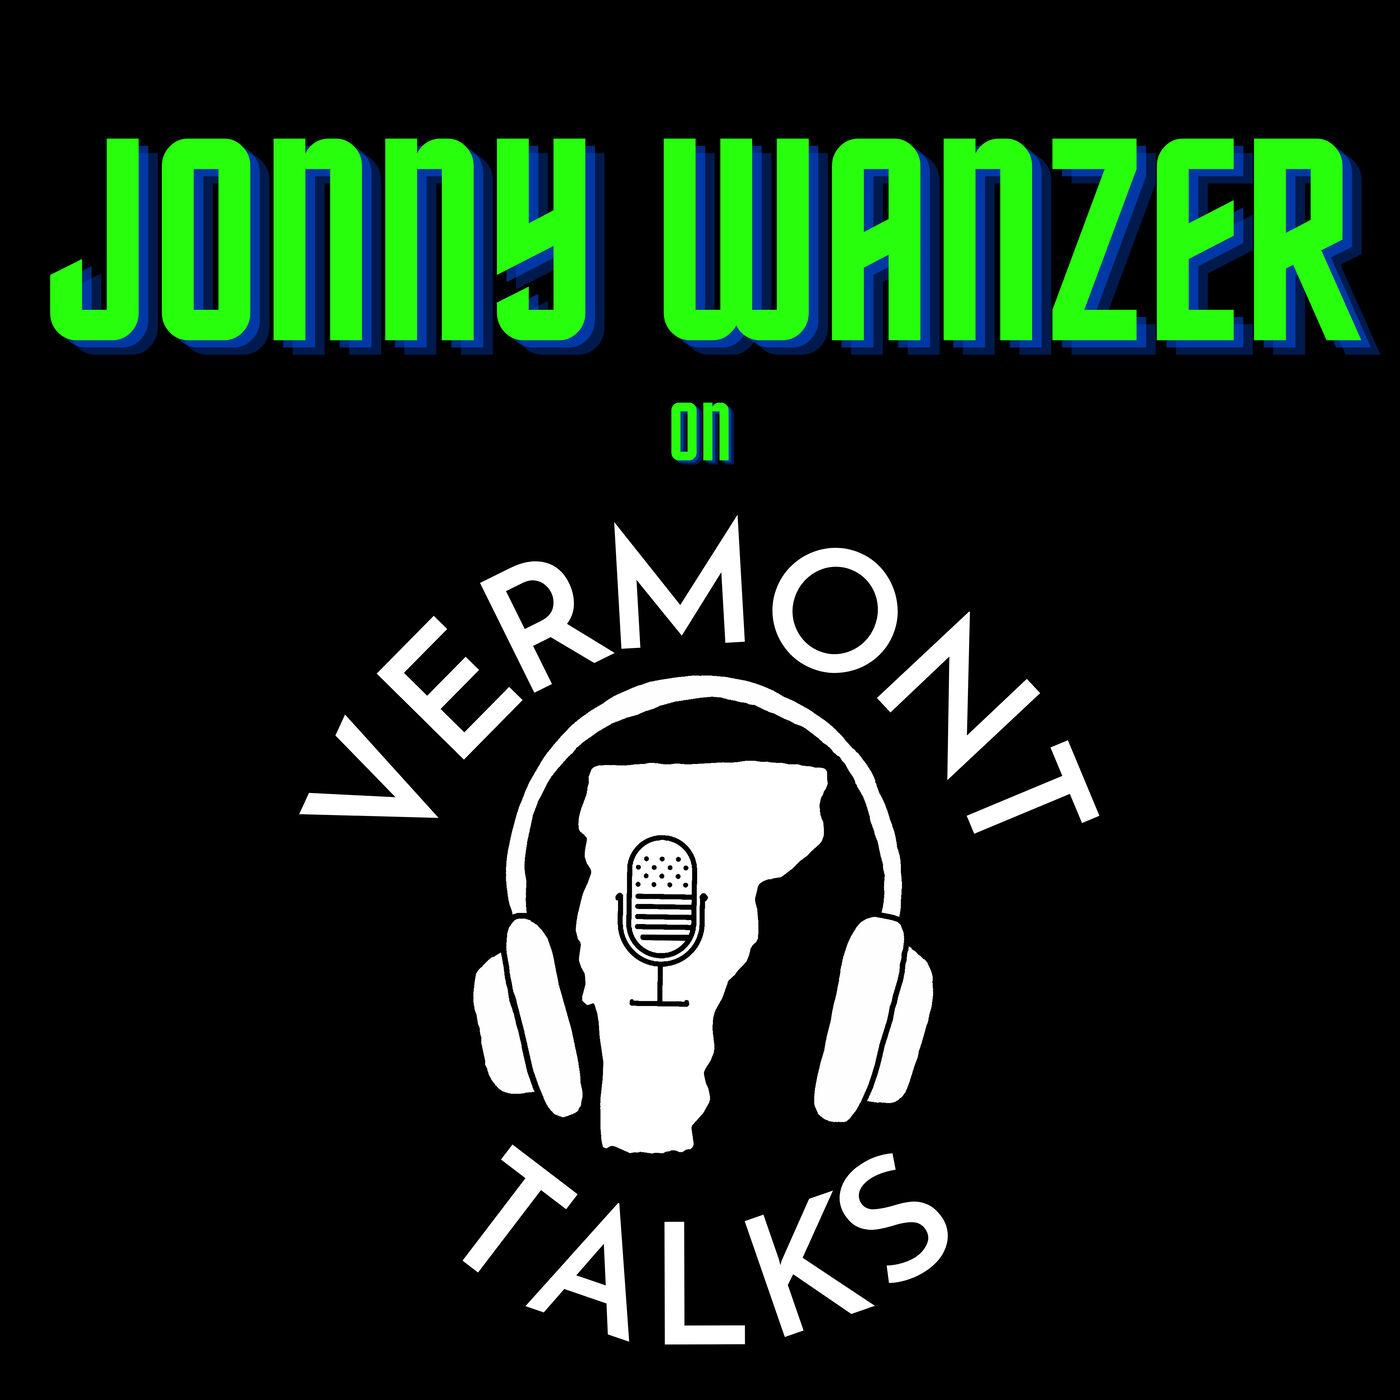 Jonny Wanzer - Anti Hero, Comedian, Musician & Political Satirist